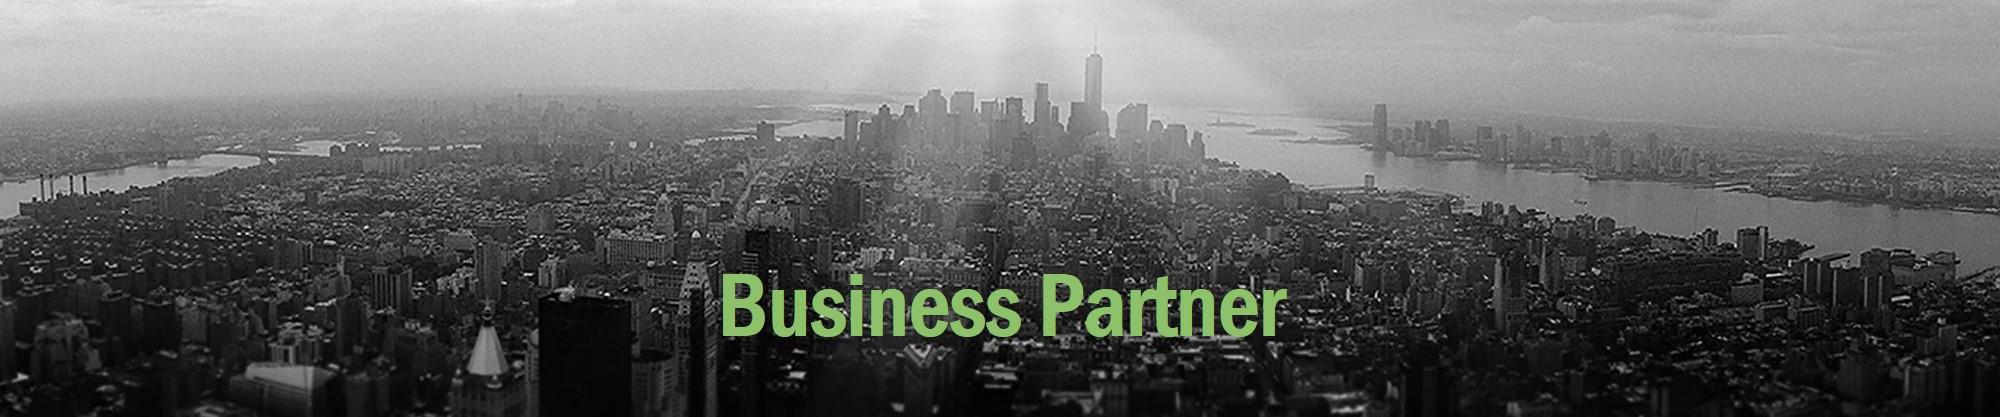 BusinessPartner_SonjaDirr_apricot.jpg